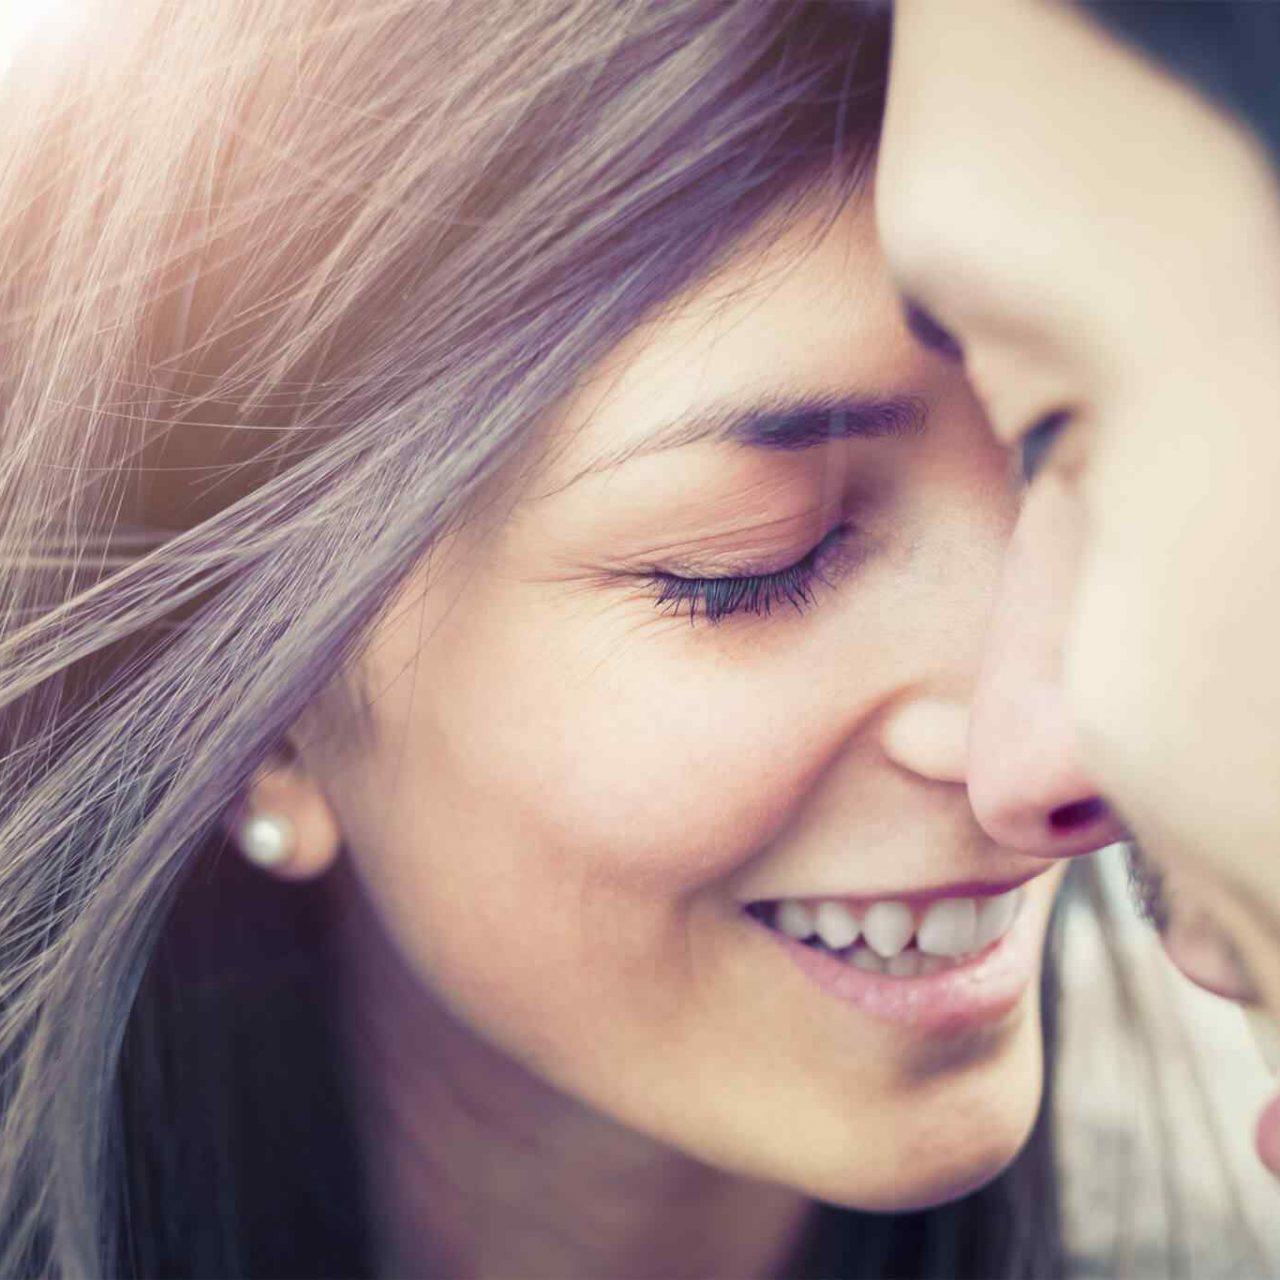 https://www.eryckdzotsi.com/wp-content/uploads/2018/01/img-class-marriage-01-1280x1280.jpg